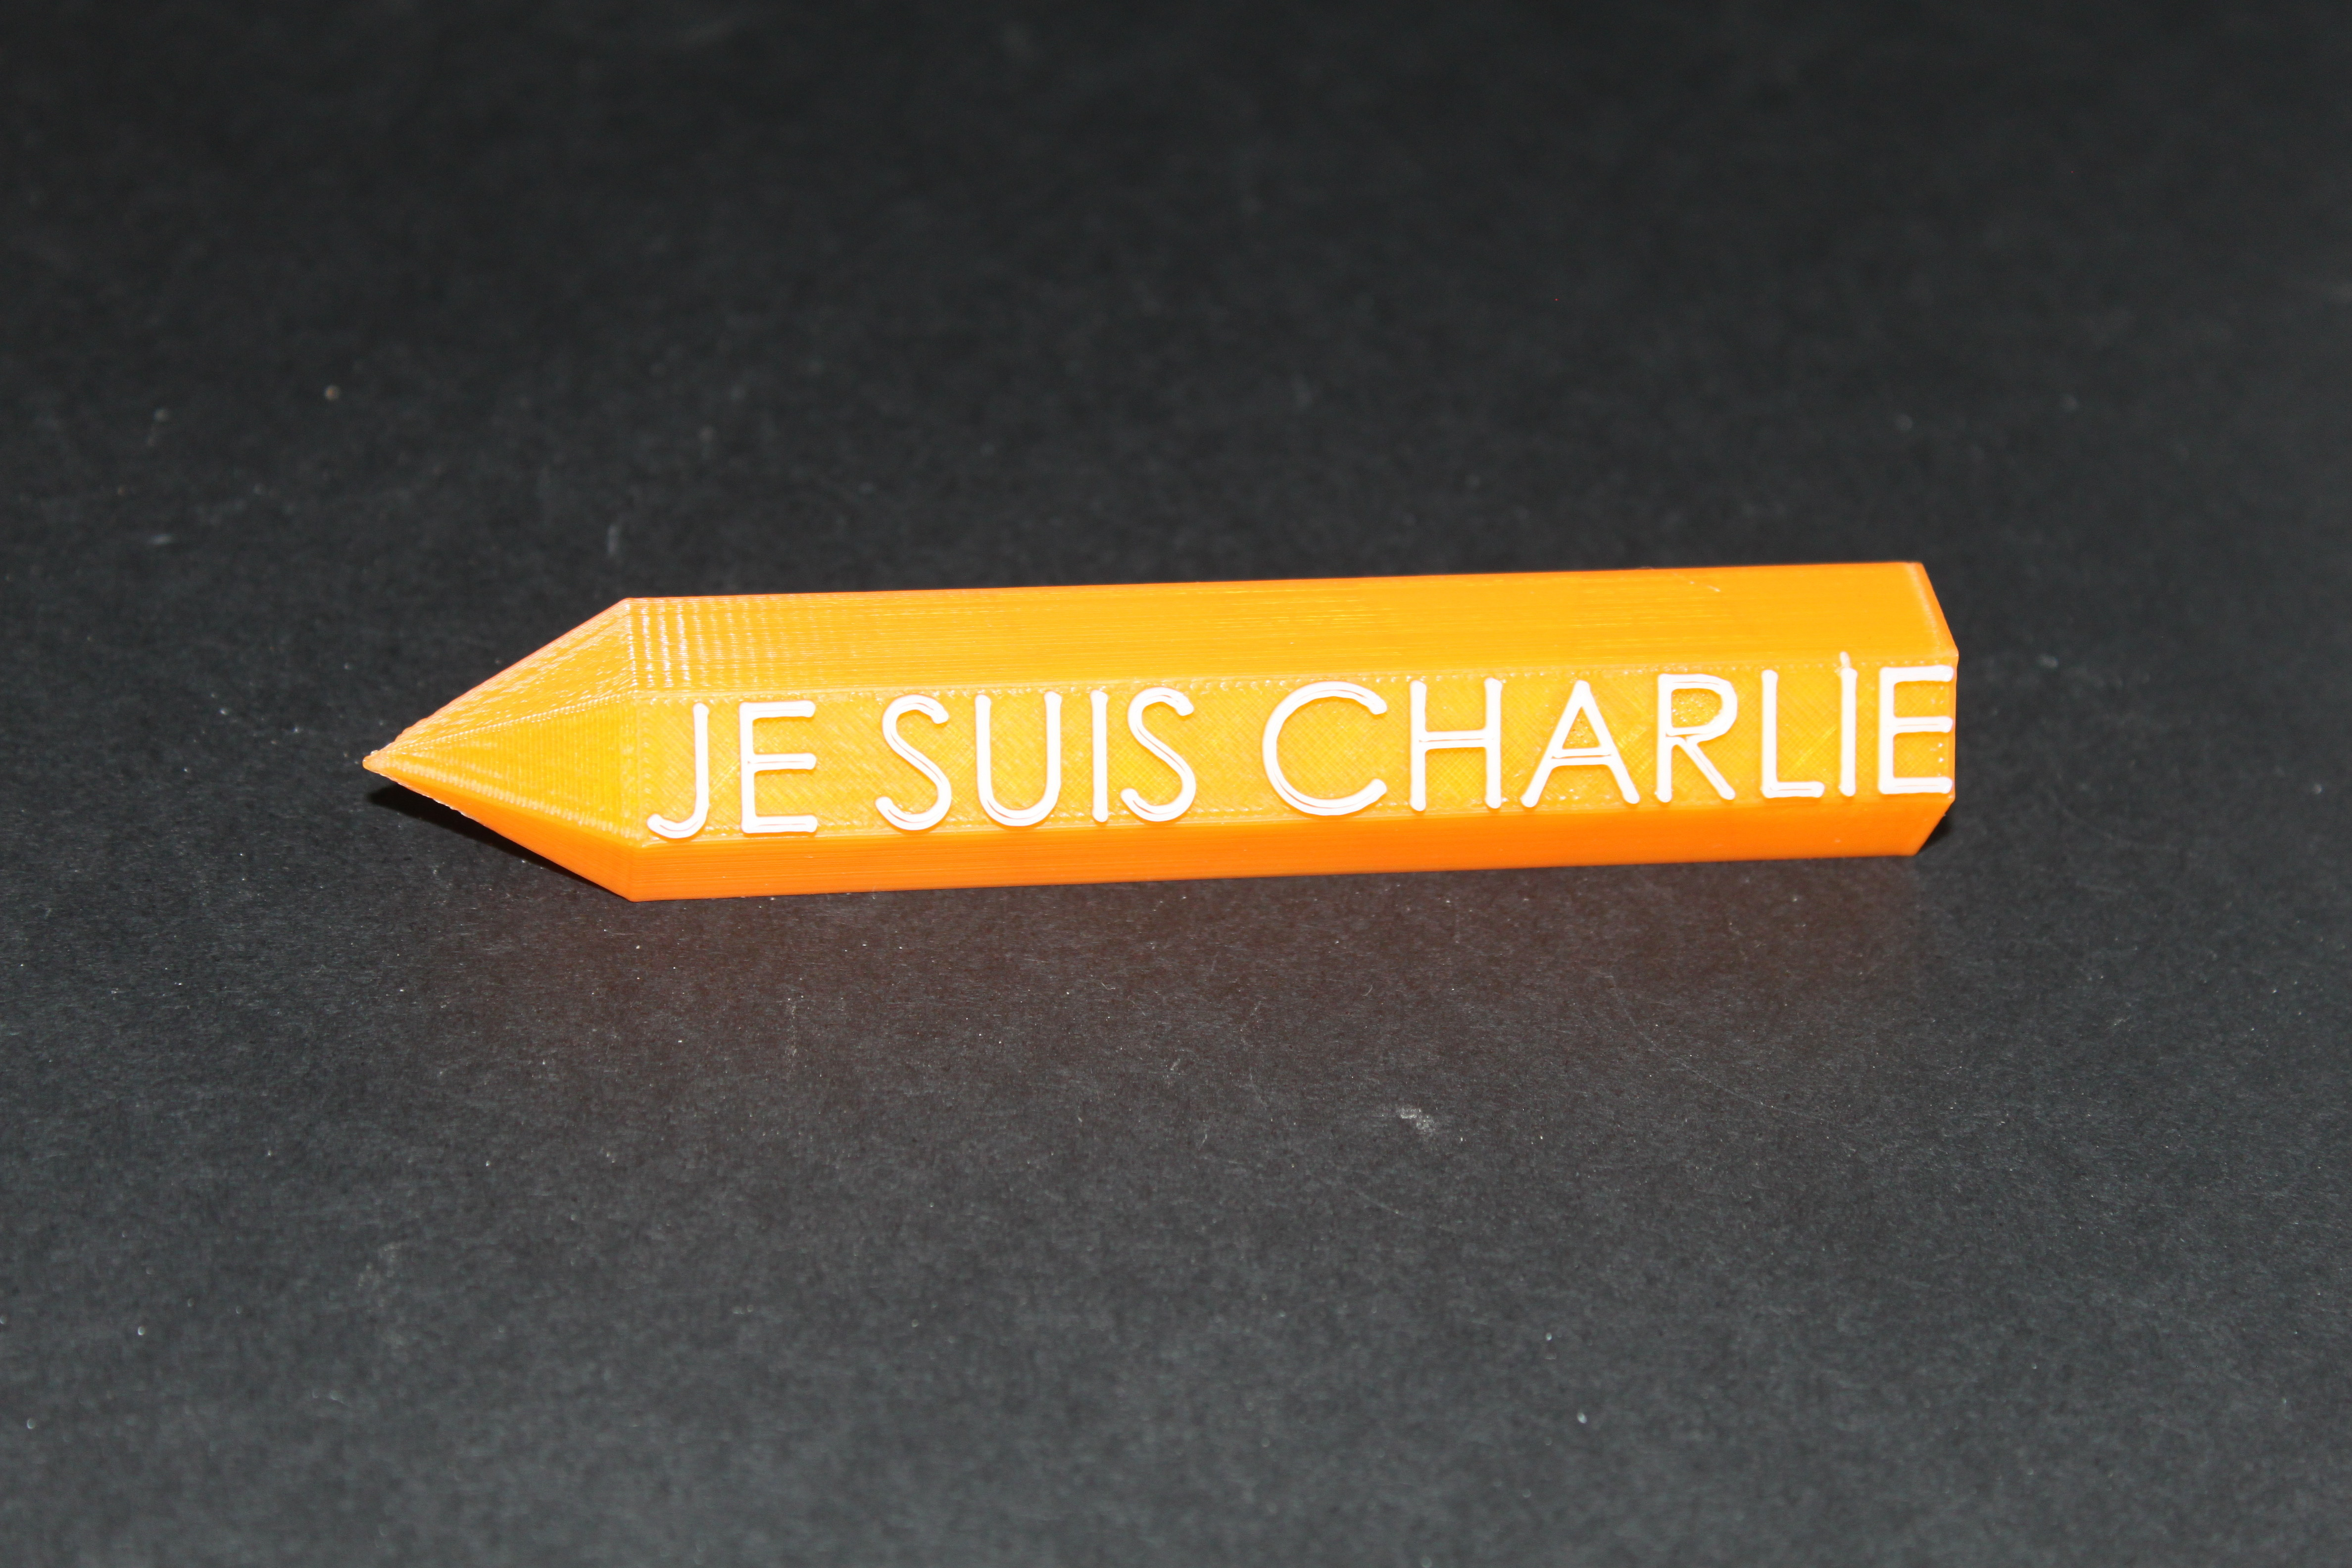 IMG_4849.JPG Download free STL file je suis charlie • 3D printer template, sevendice